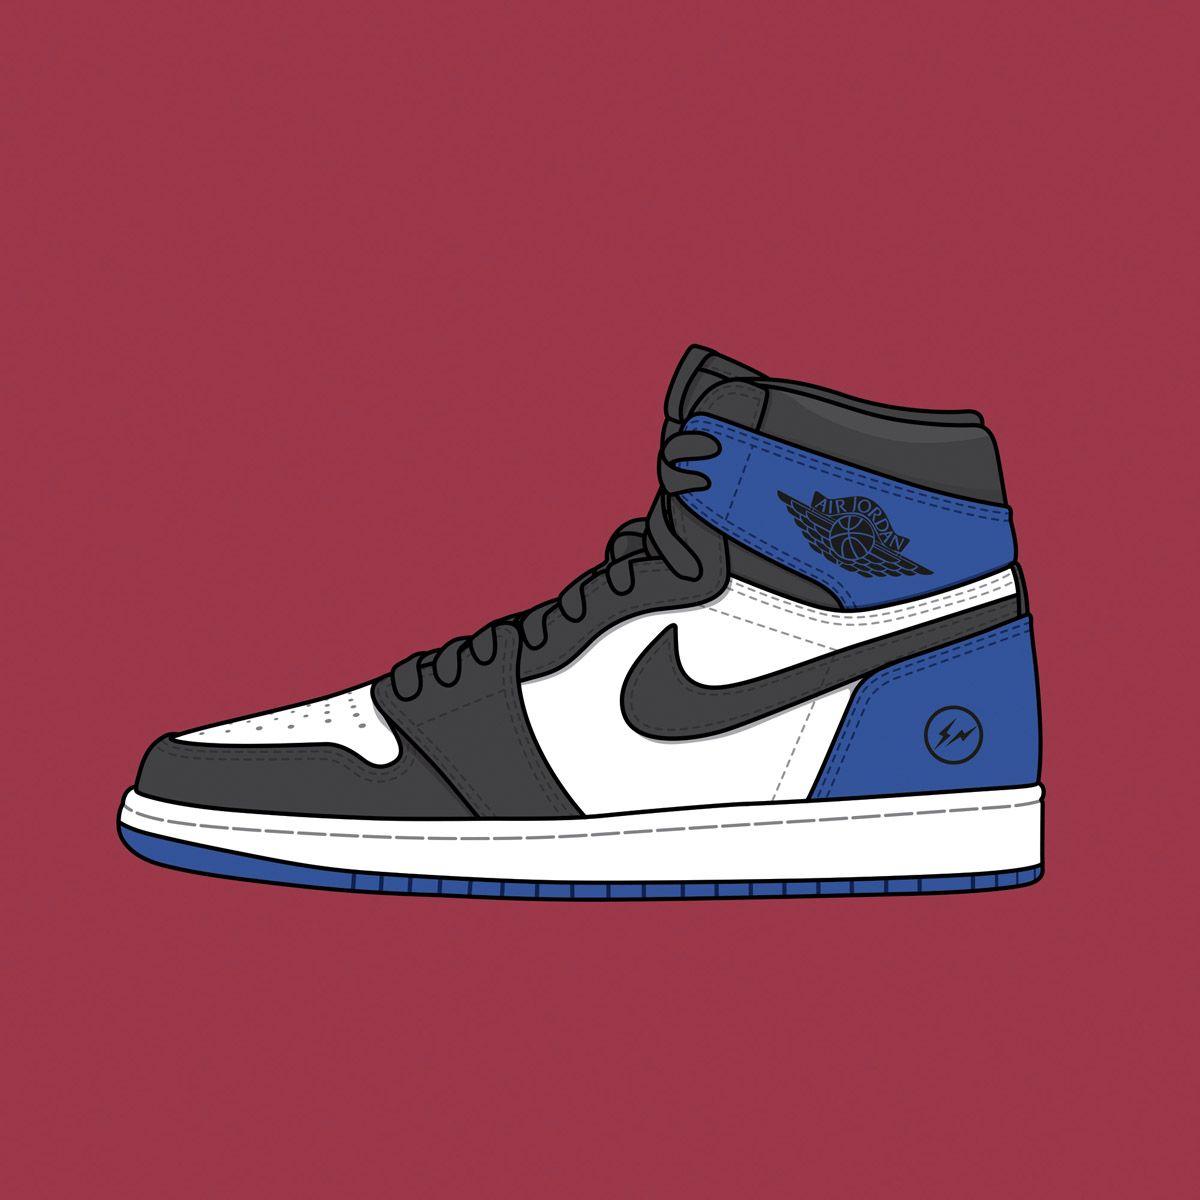 size 40 d5291 83835 Nike Air Jordan 1 Resell Values: A Full Ranking